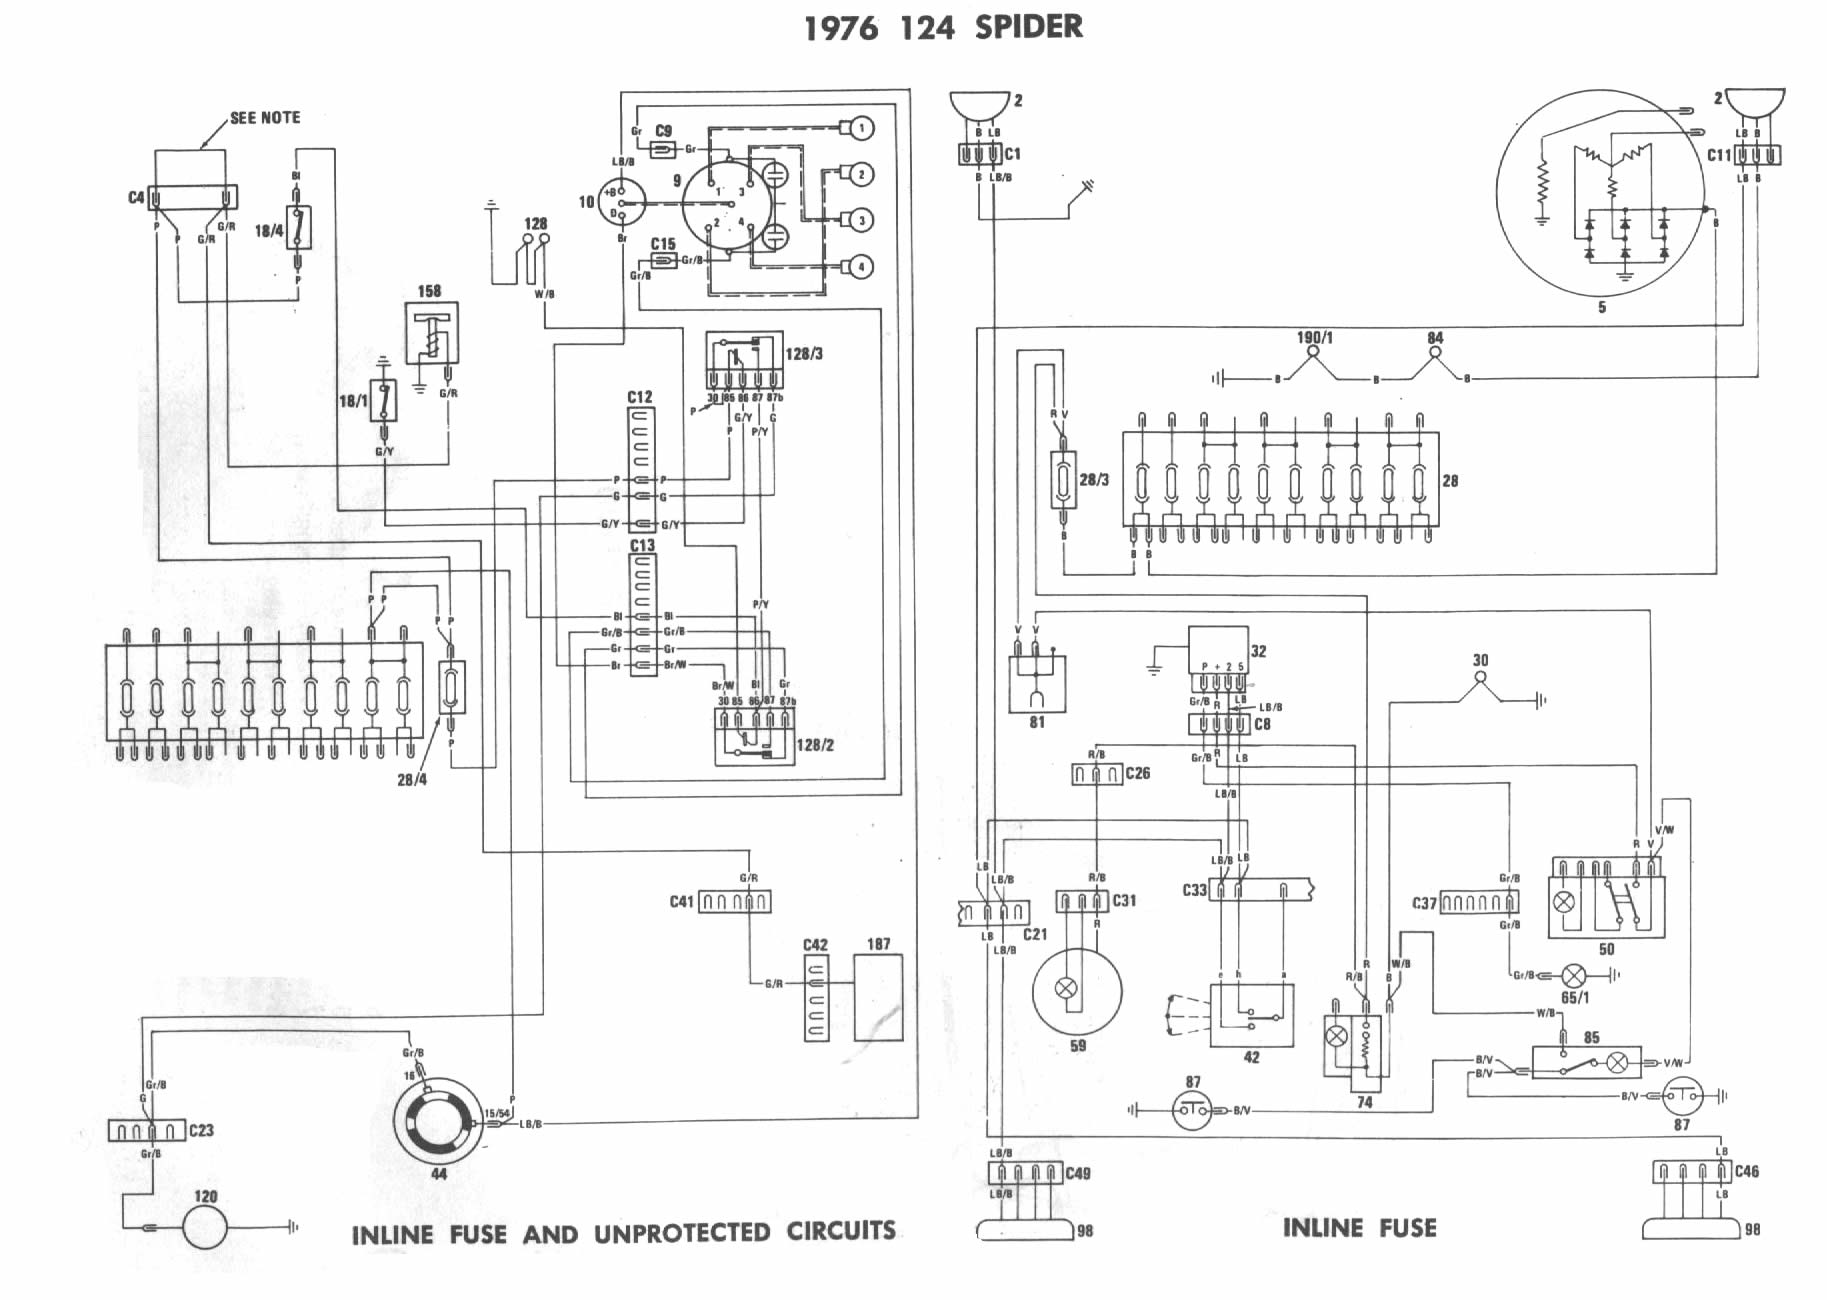 Fiat Panda Wiring System Diagram Schematics Diagrams Dexta Car Manuals Pdf Fault Codes Rh Automotive Net 1973 12 500